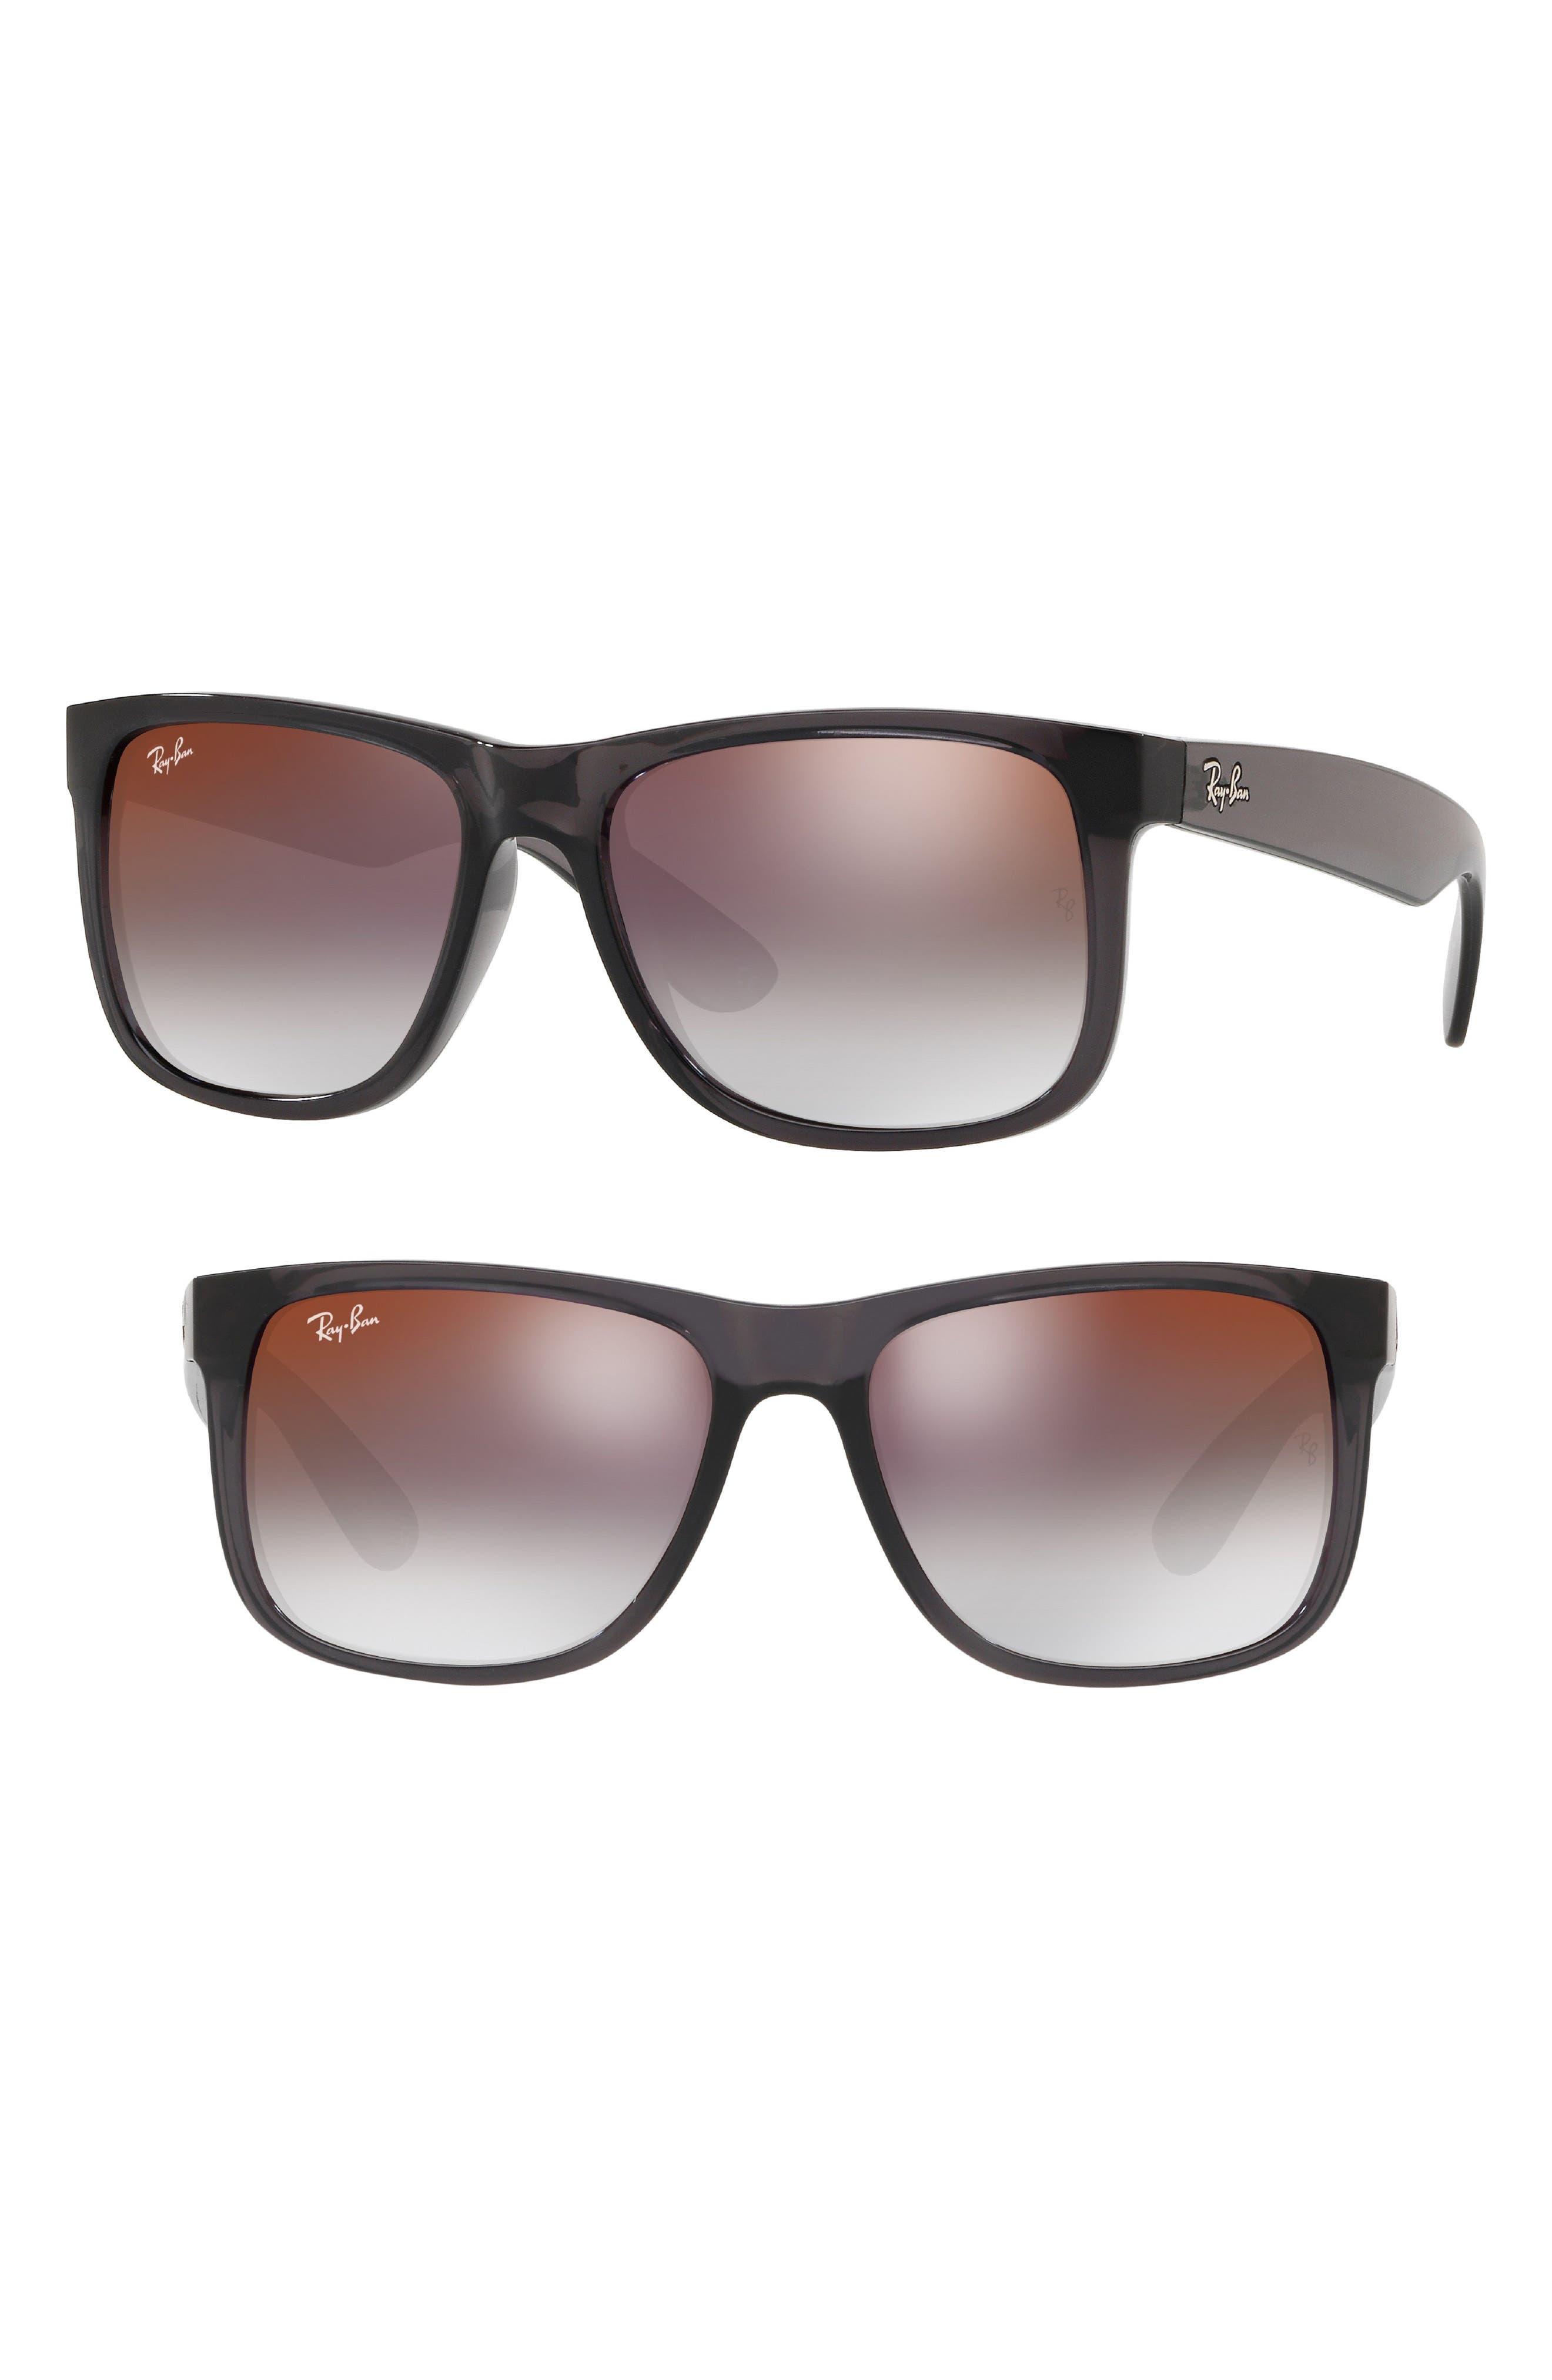 Justin 54mm Sunglasses,                             Main thumbnail 1, color,                             020